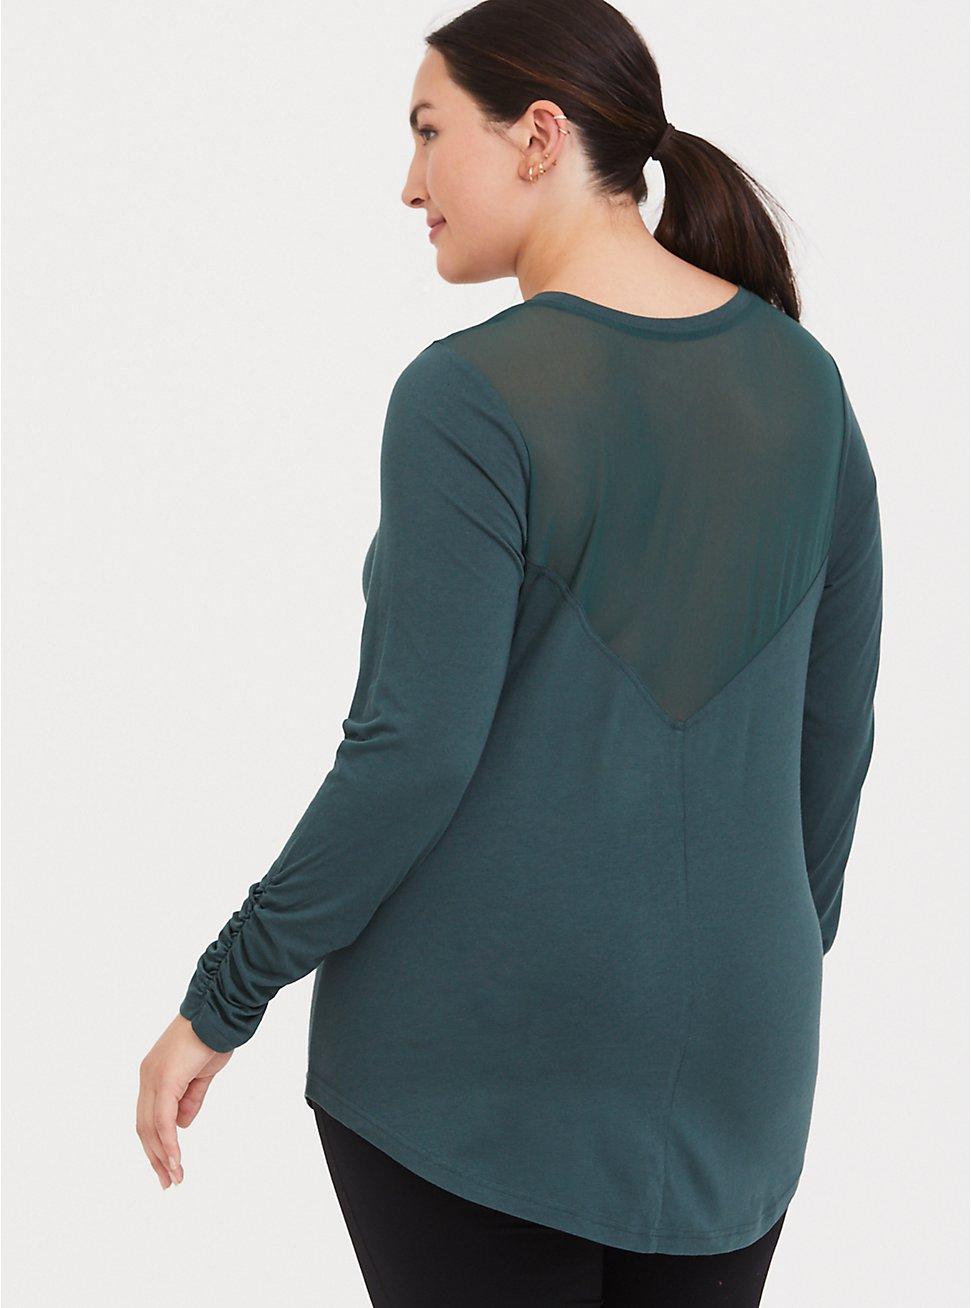 Plus Size Green Mesh Long Sleeved Active Tee, MUSHROOM, hi-res